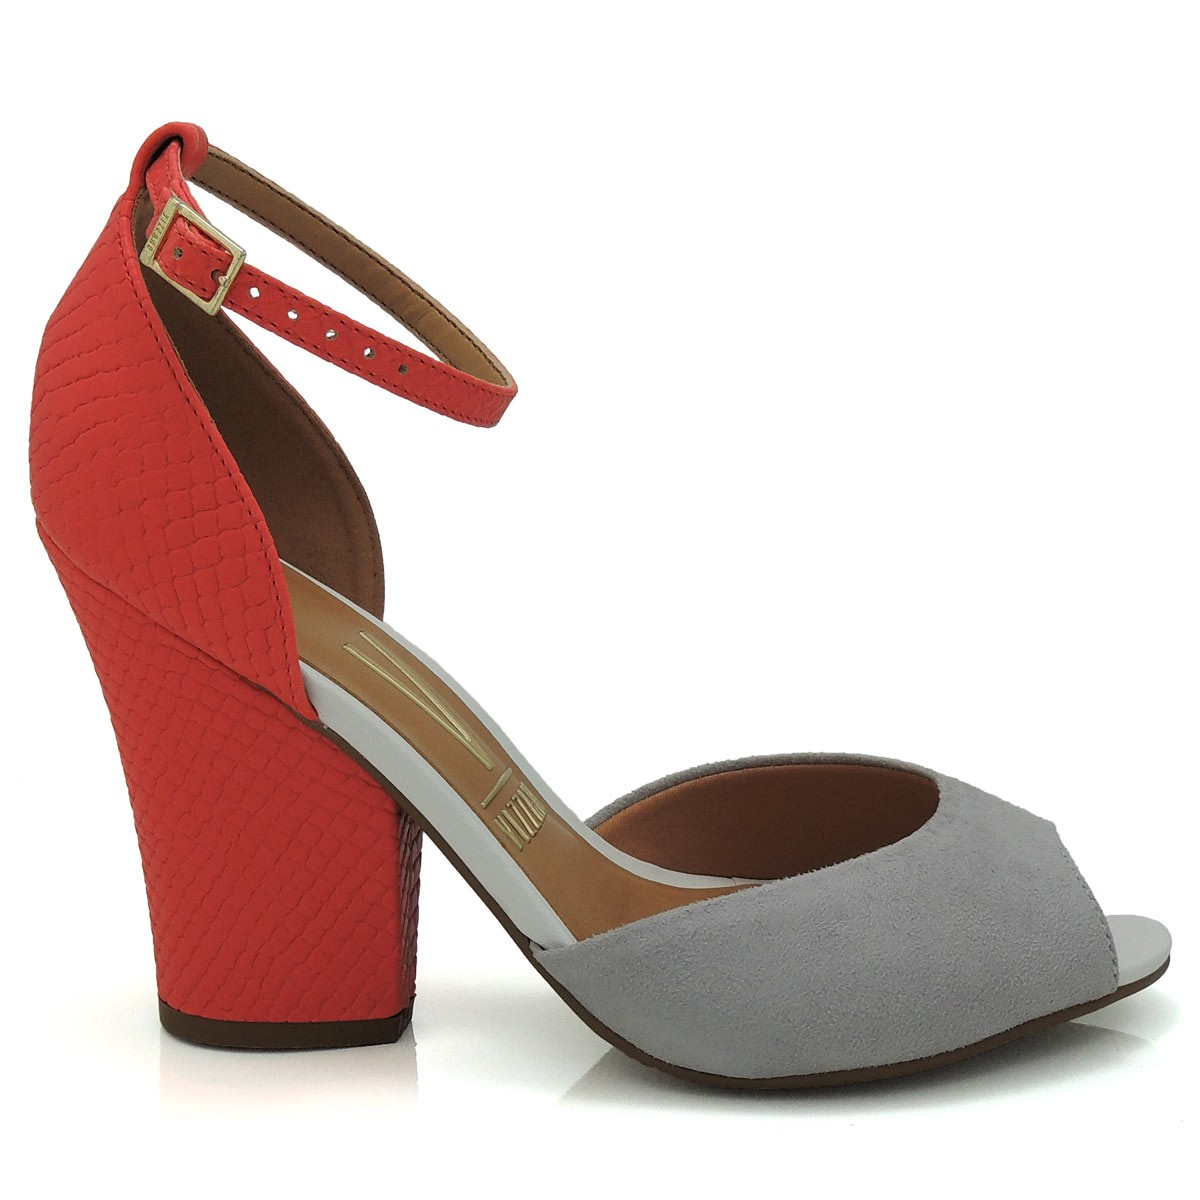 38988346bb sandalia-feminina-vizzano-6214232-salto-grosso -2722e24d72dca5c83efd1a3b66edb327.jpg